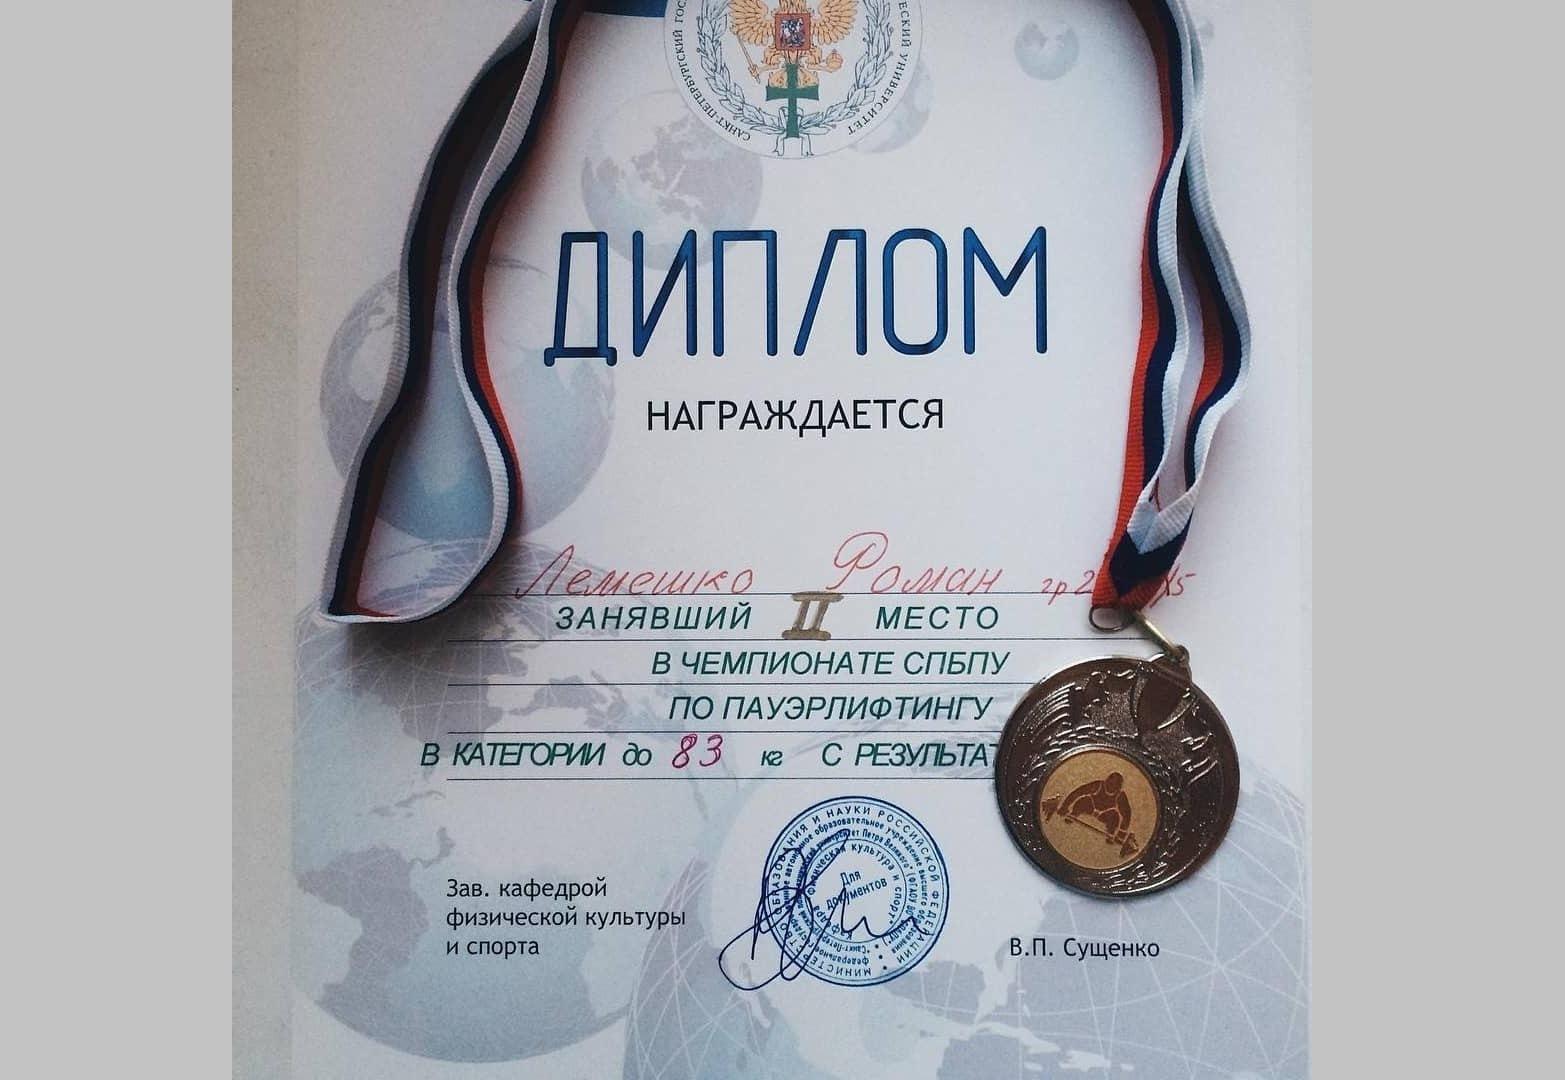 Чемпионат по пауэрлифтингу